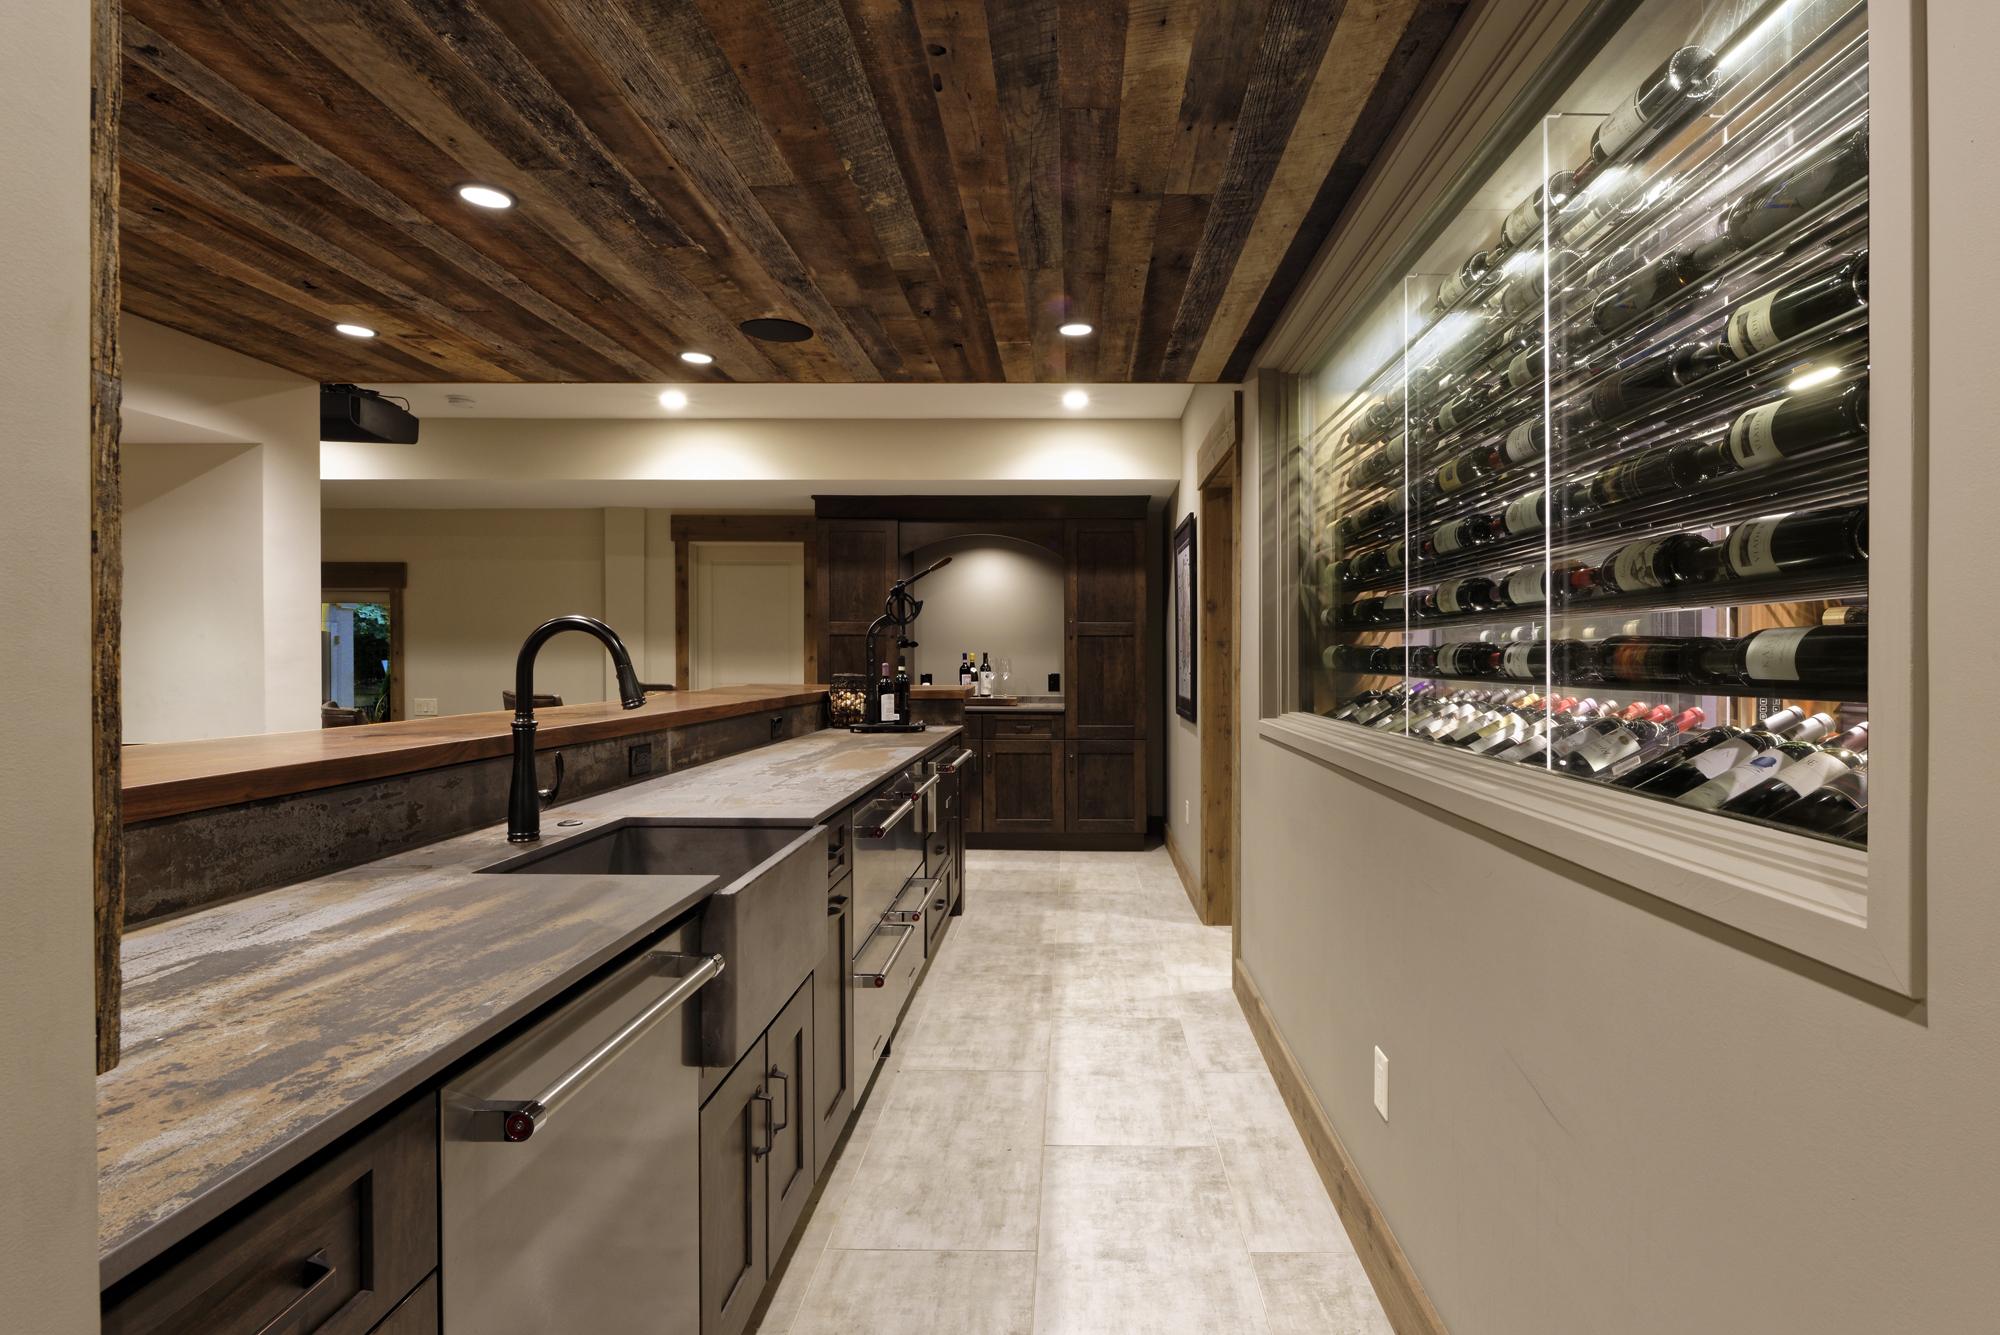 Bar Wine Rooms Photo Gallery Bowa Design Build Renovations